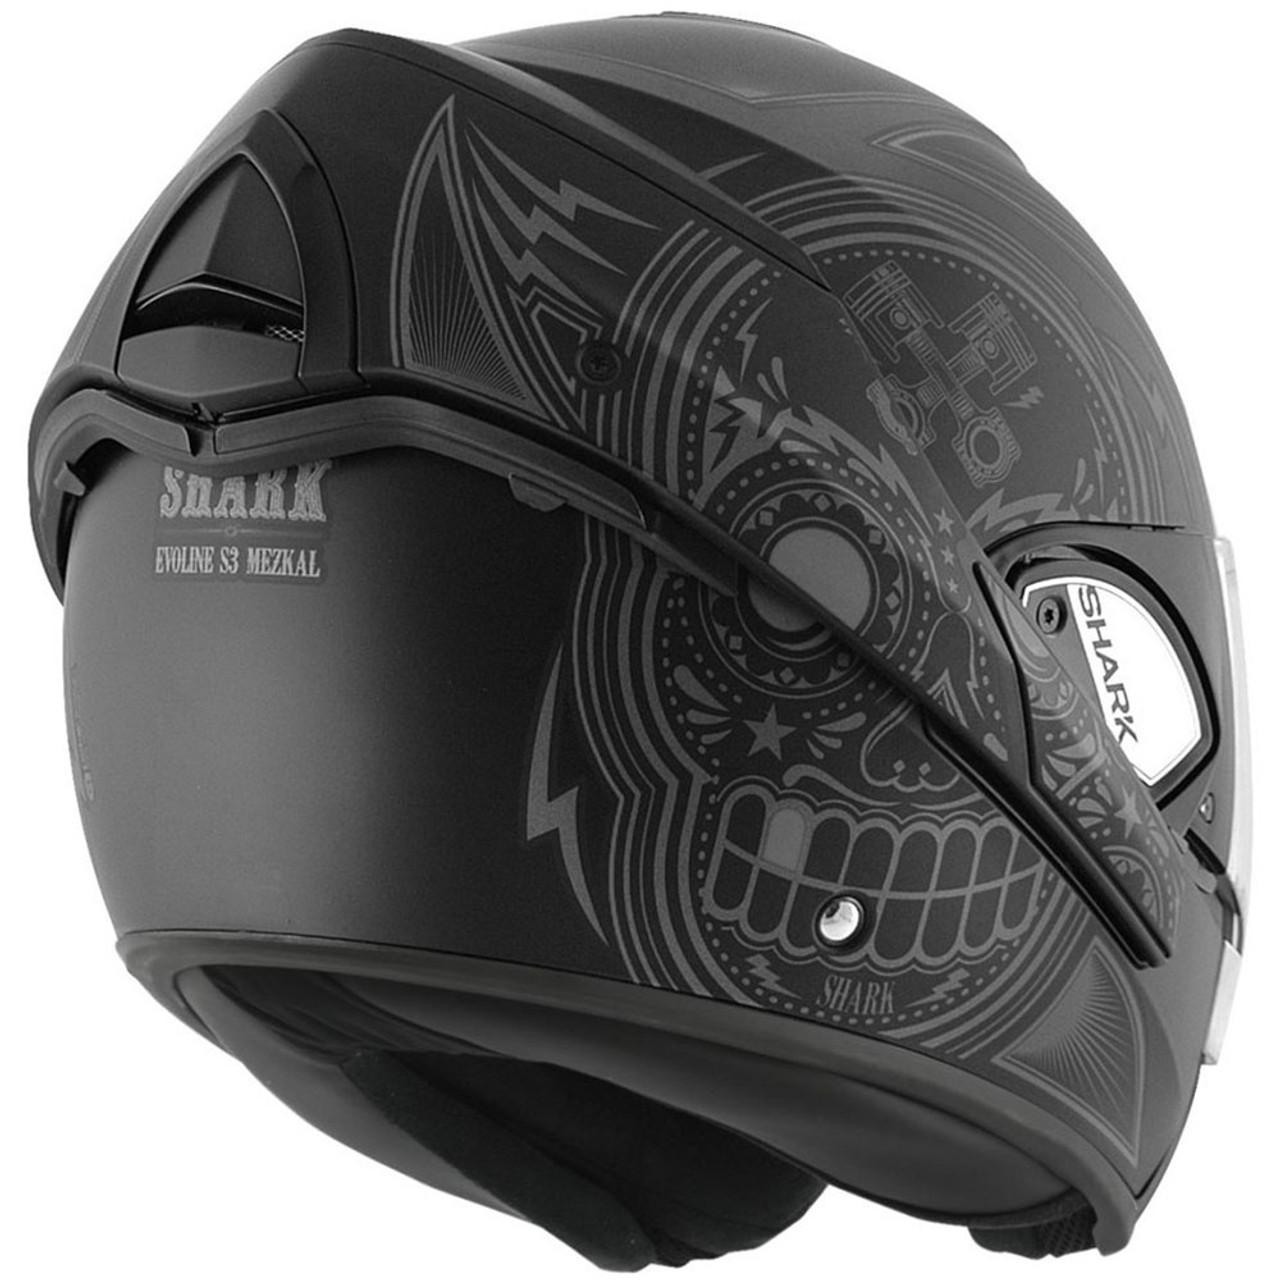 b05b5d9c6e76c4 Shark Evoline 3 Mezcal Matte Black Modular Helmet - HE9347DKASL ...